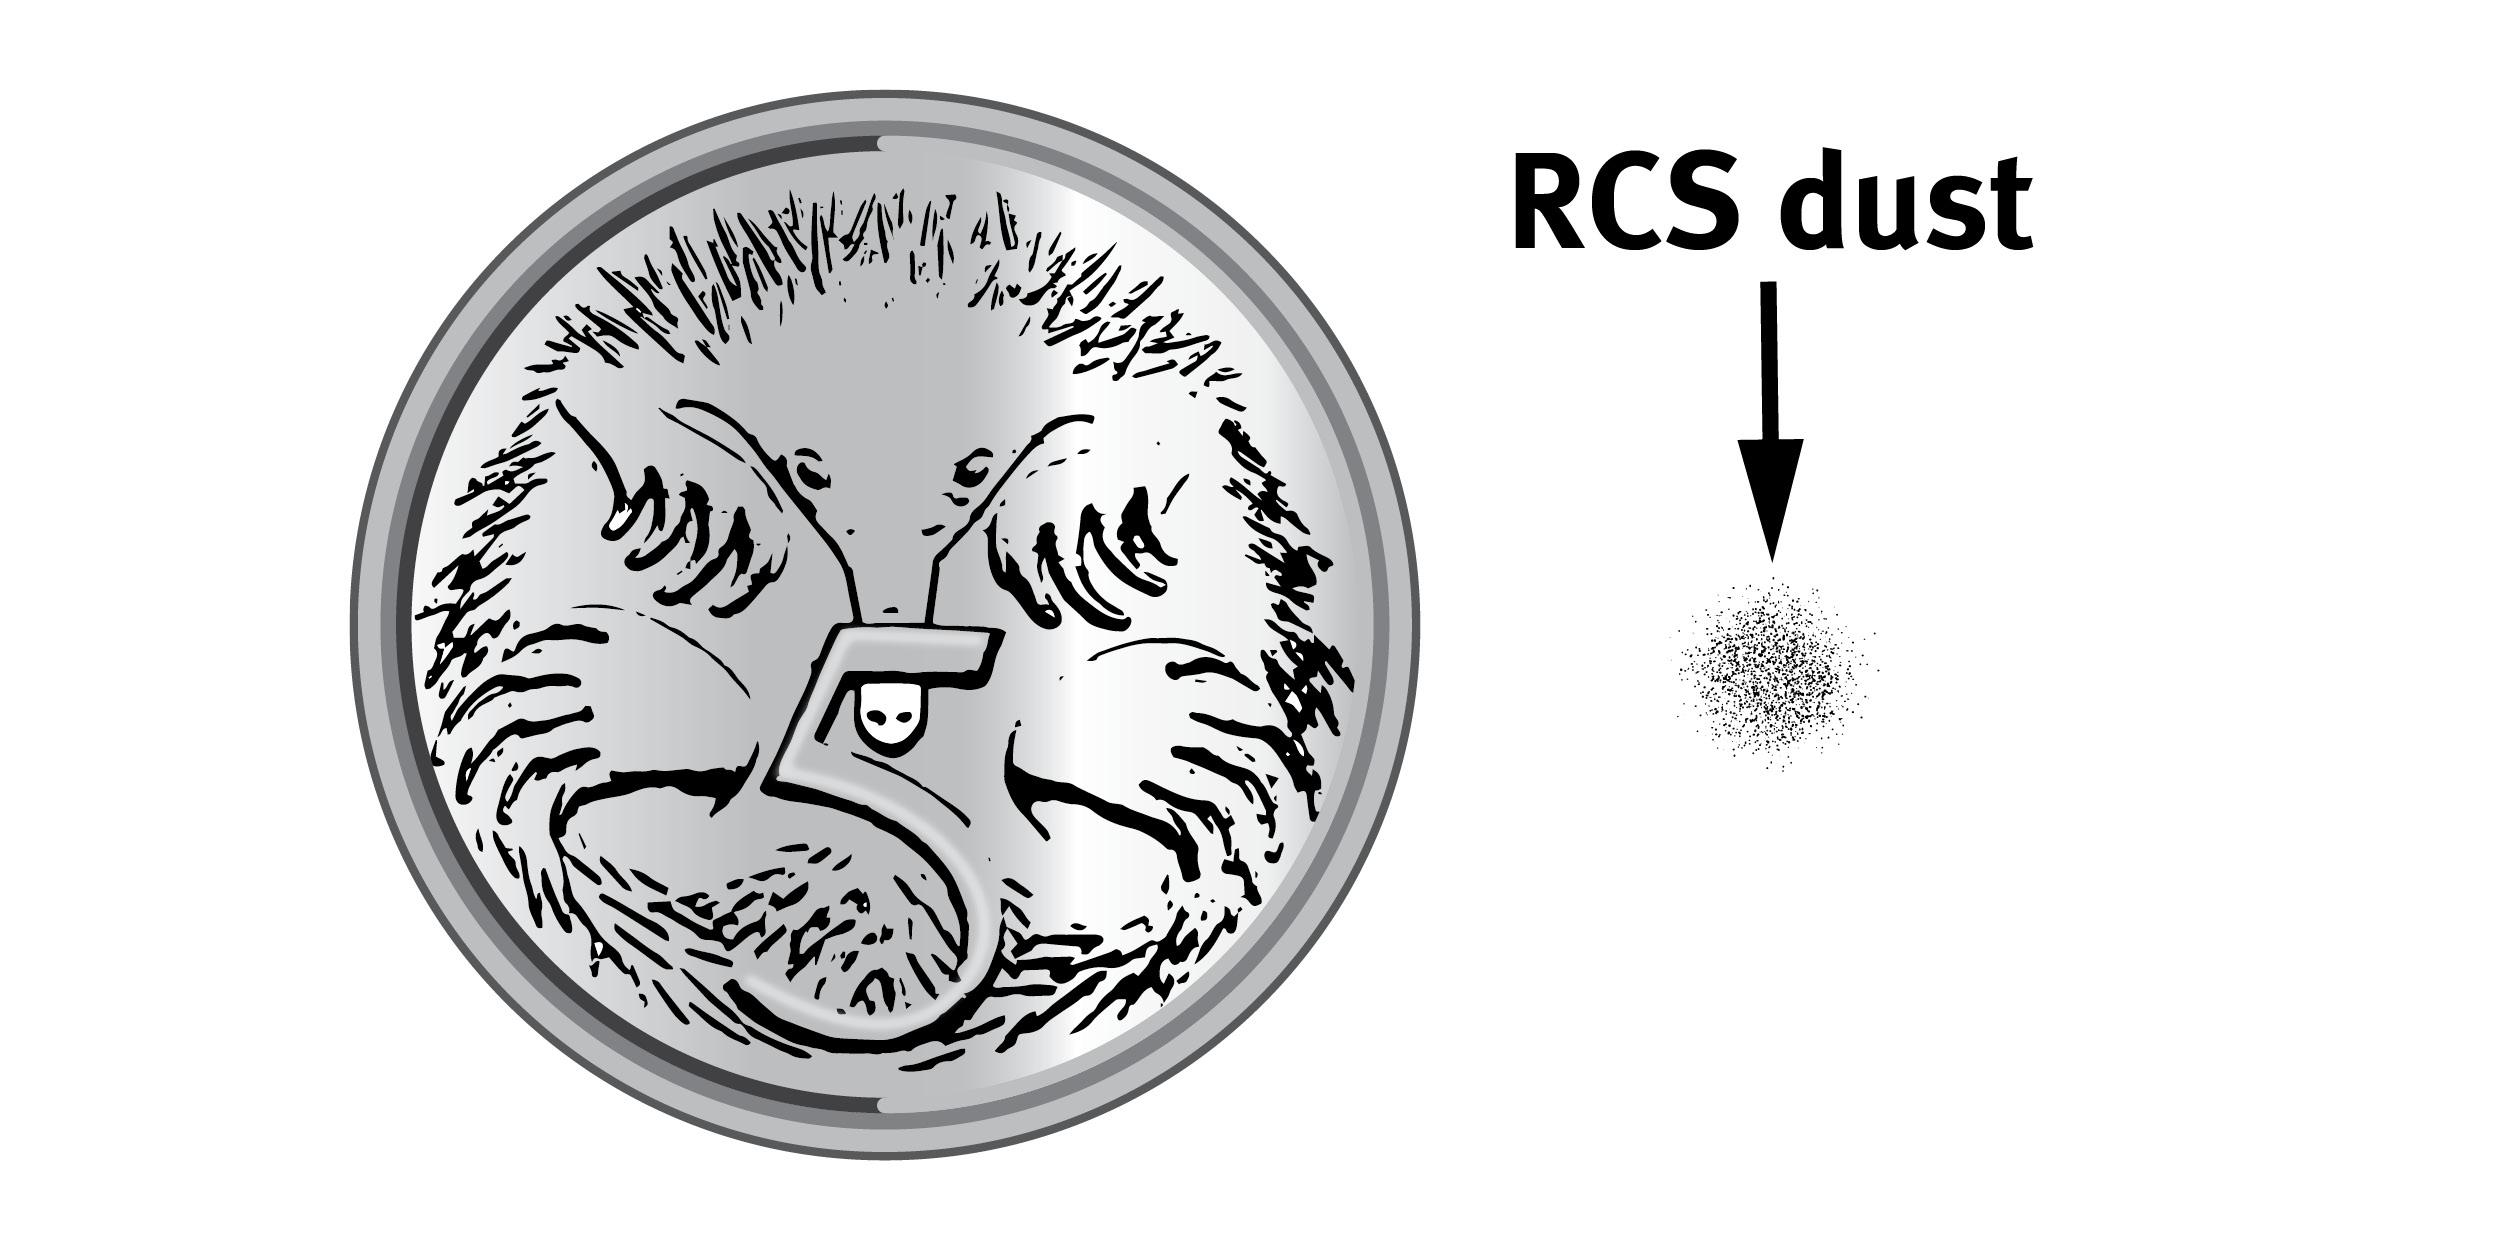 RCS dust